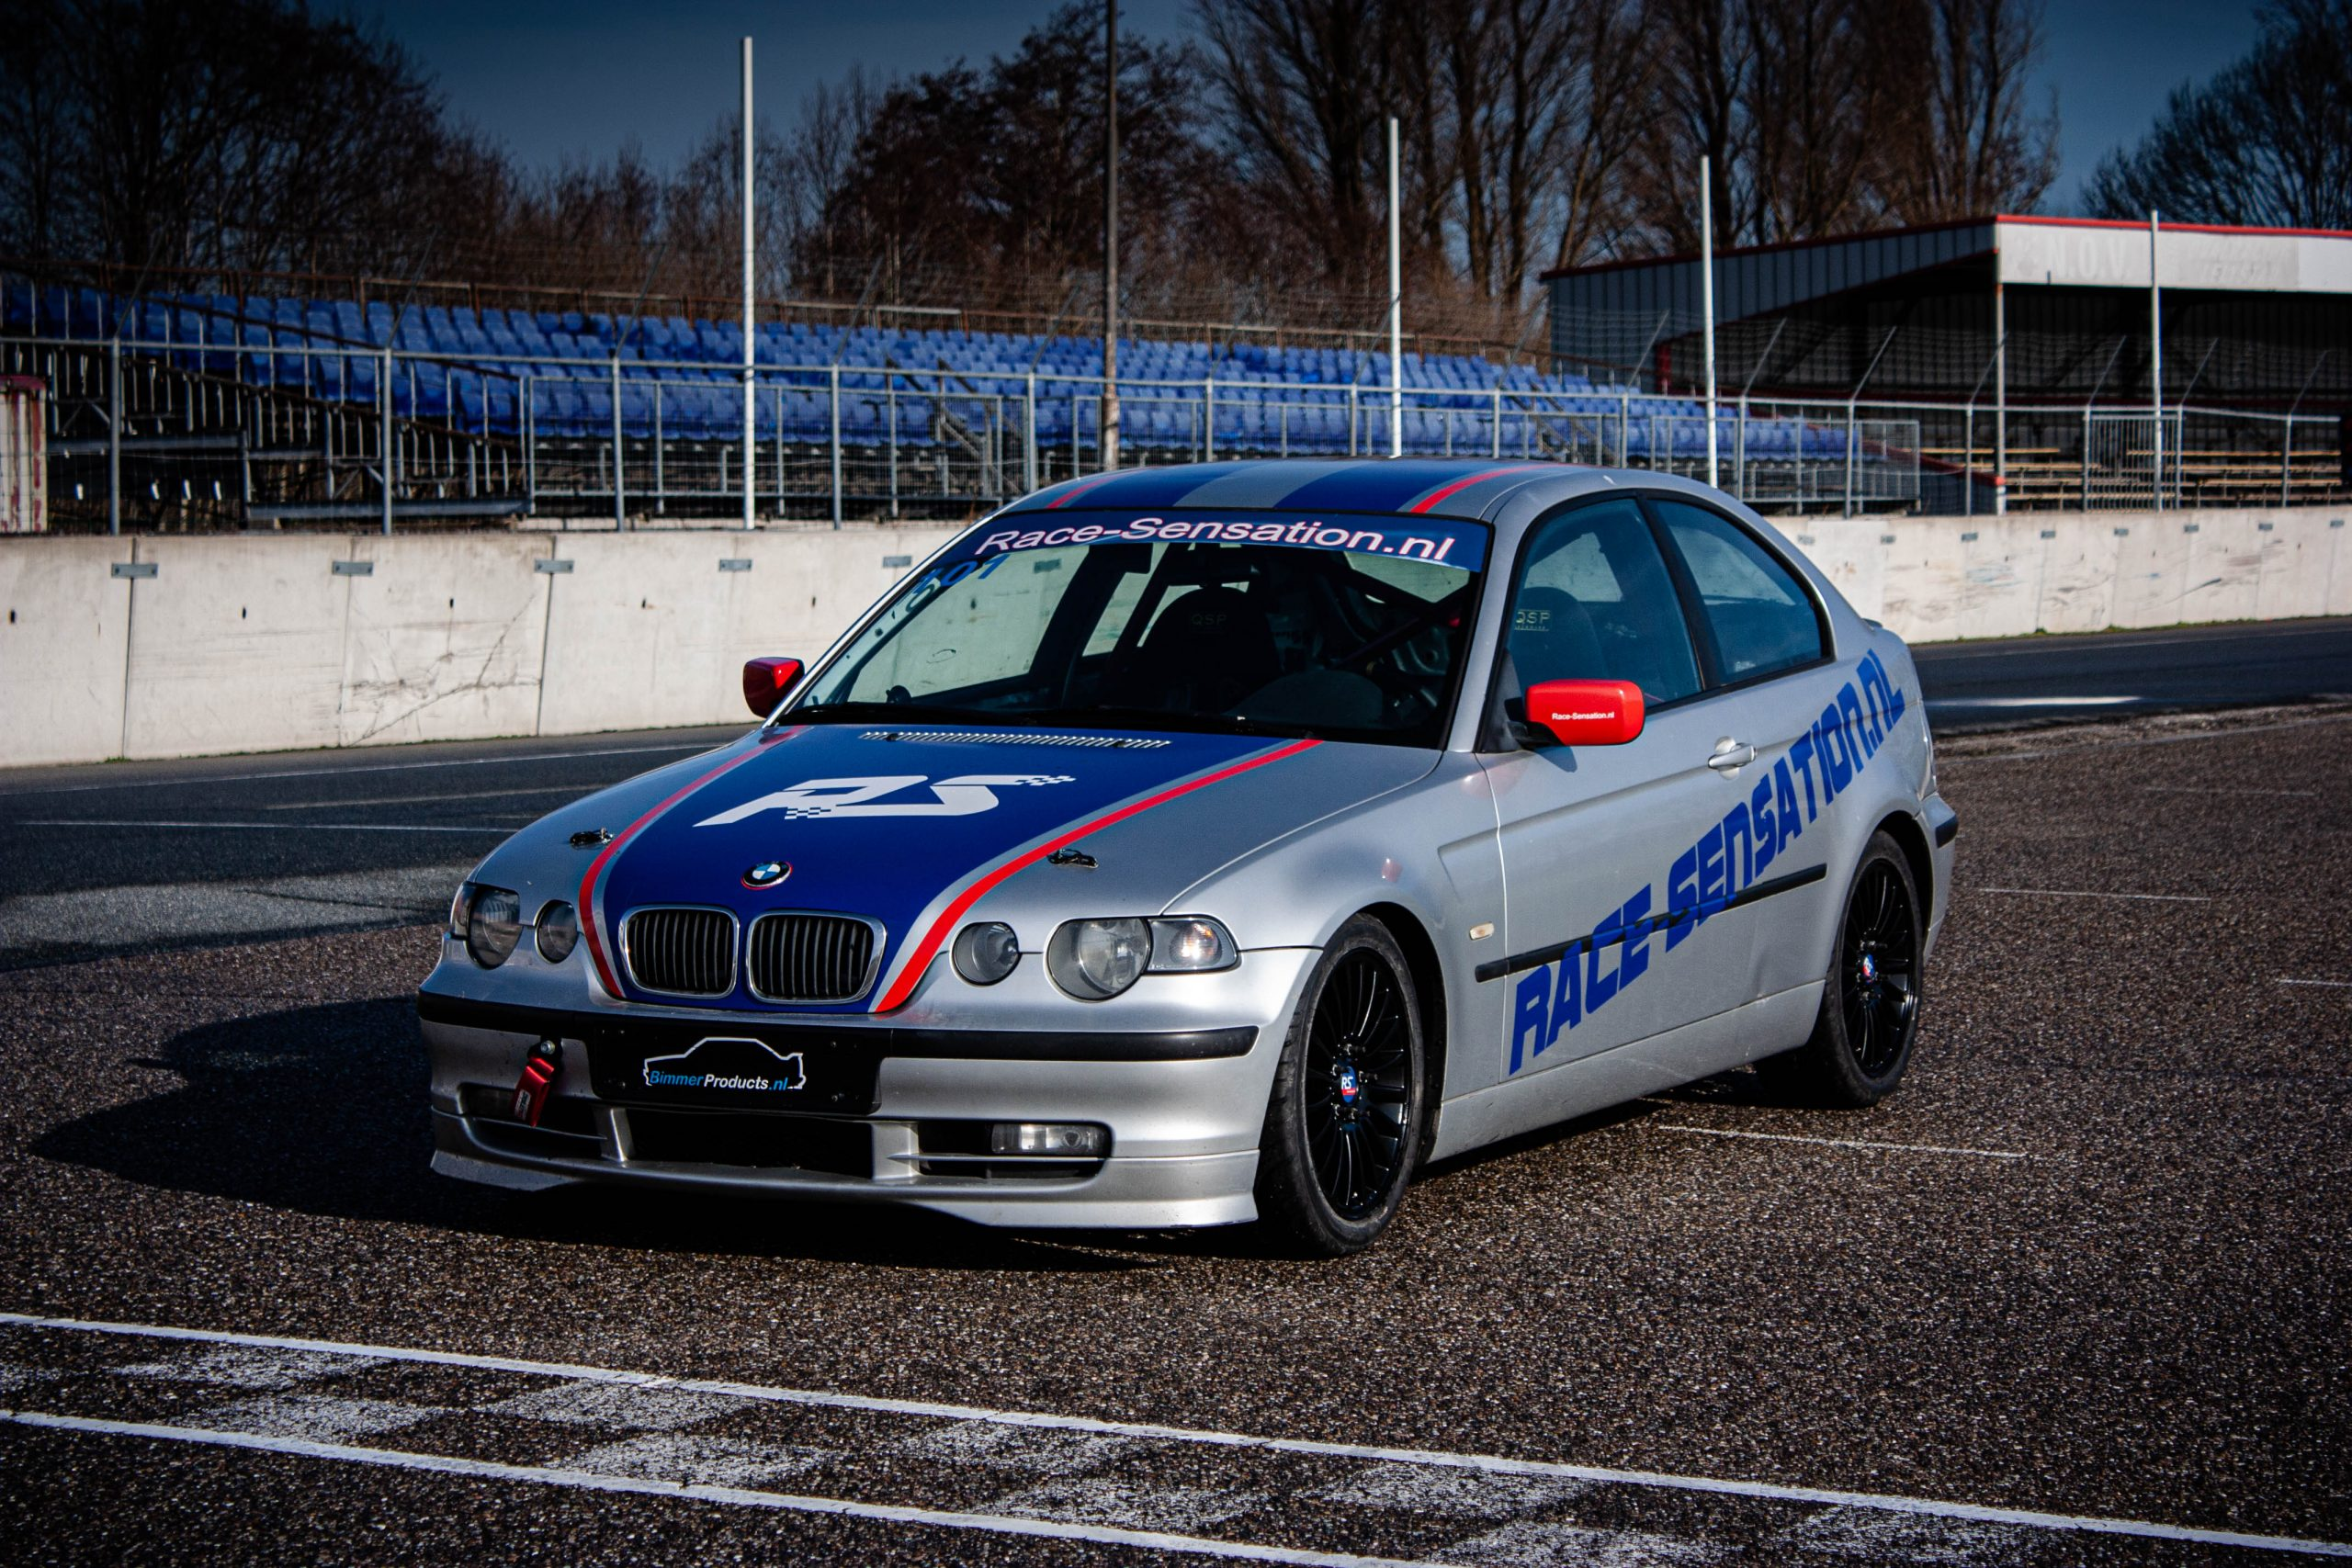 Race Sensation Circuit Taxi